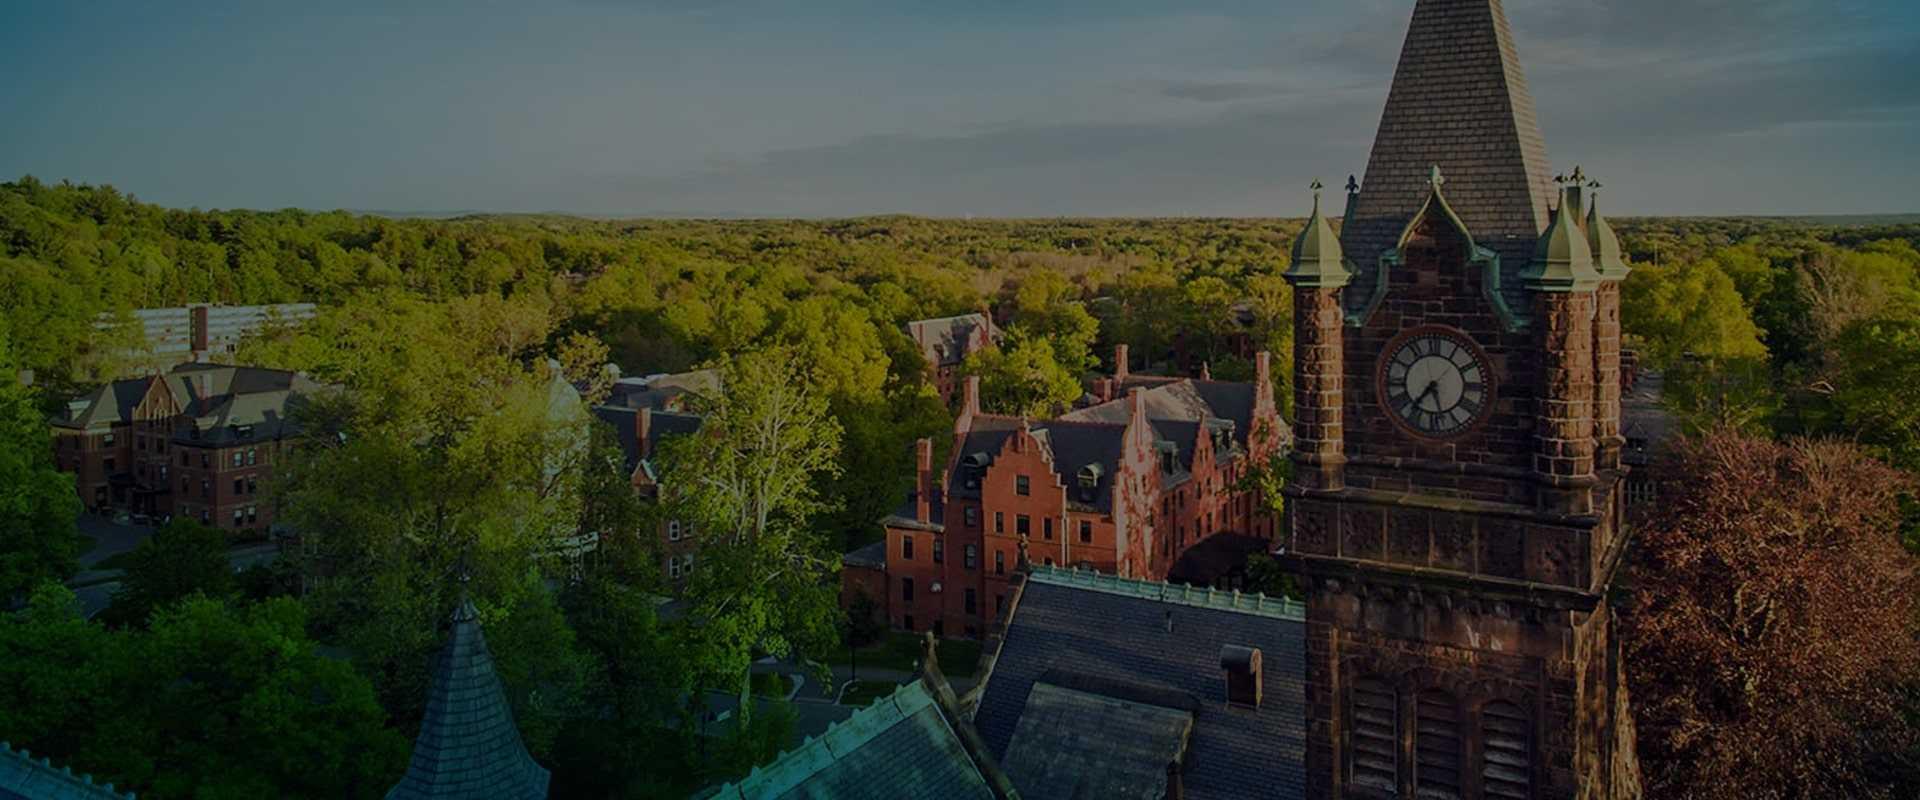 mt-holyoke-college-1